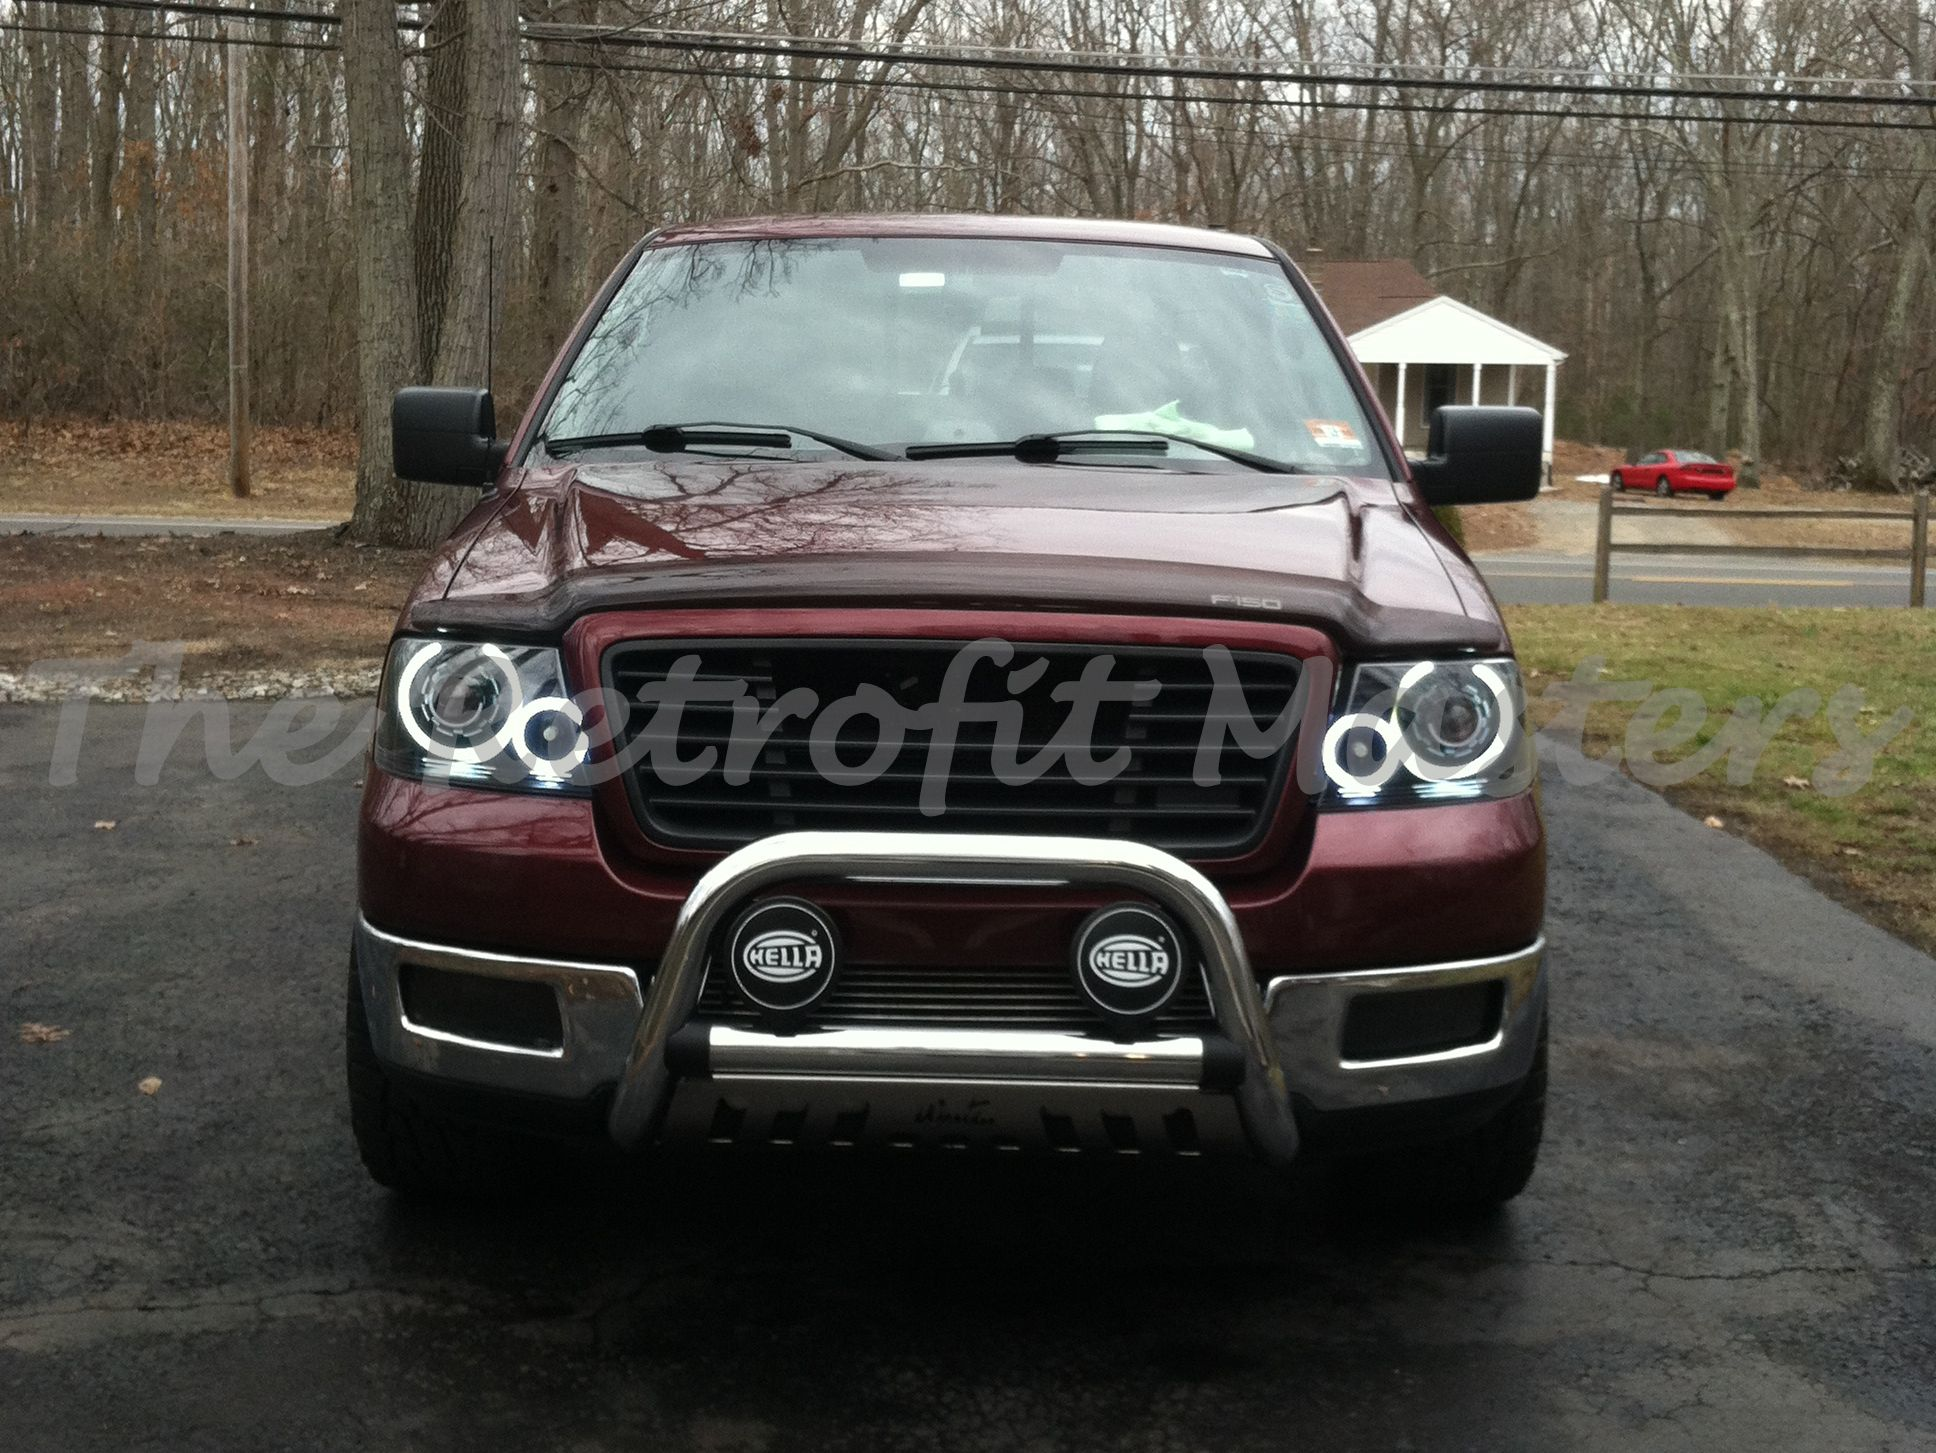 2004 2008 Ford F 150 Headlights Retrofitted W Morimoto Mini H1 Projectors Featuring White Oracle Halos Amber Xb Led Custom Headlights Led Halos Halo